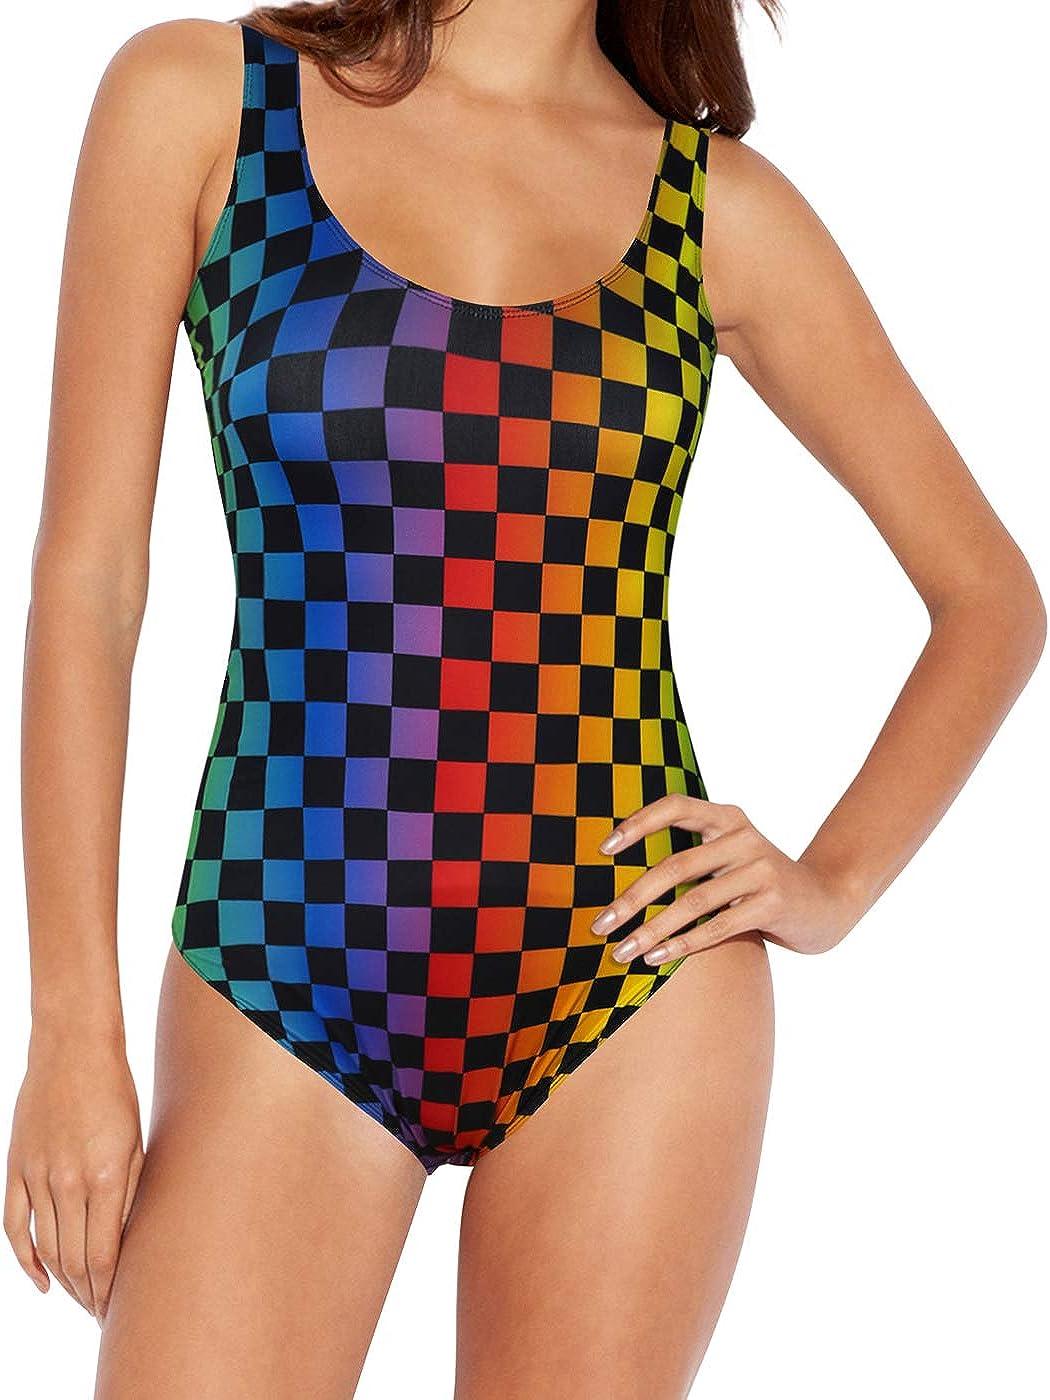 HDE Plus Size Rave Bodysuit - Sparkly Rave Clothes for Women – Festival Clothing